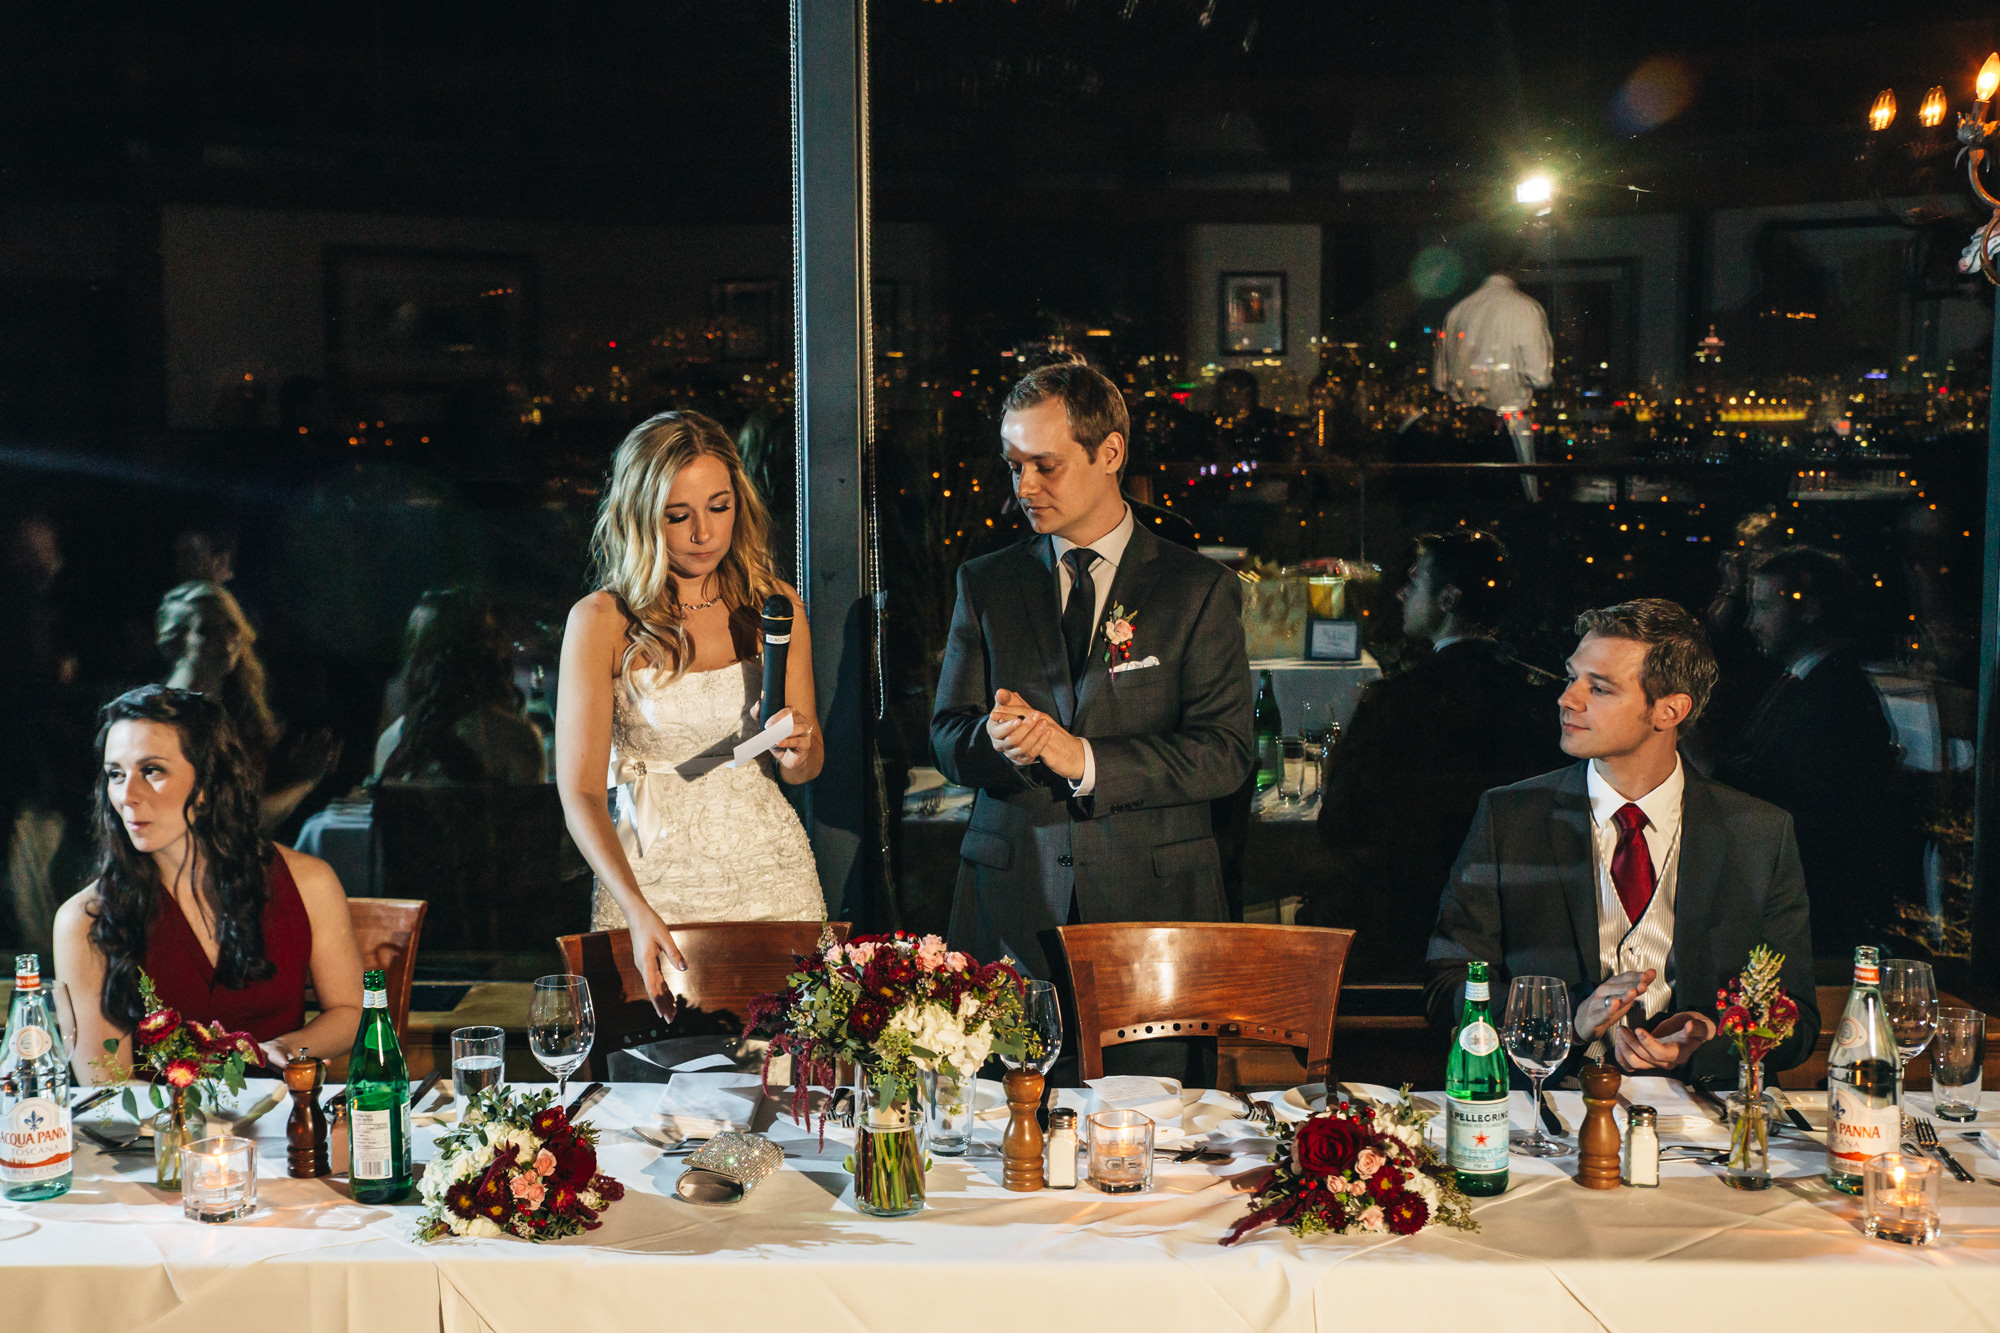 53-seasons-in-the-park-wedding-reception.jpg